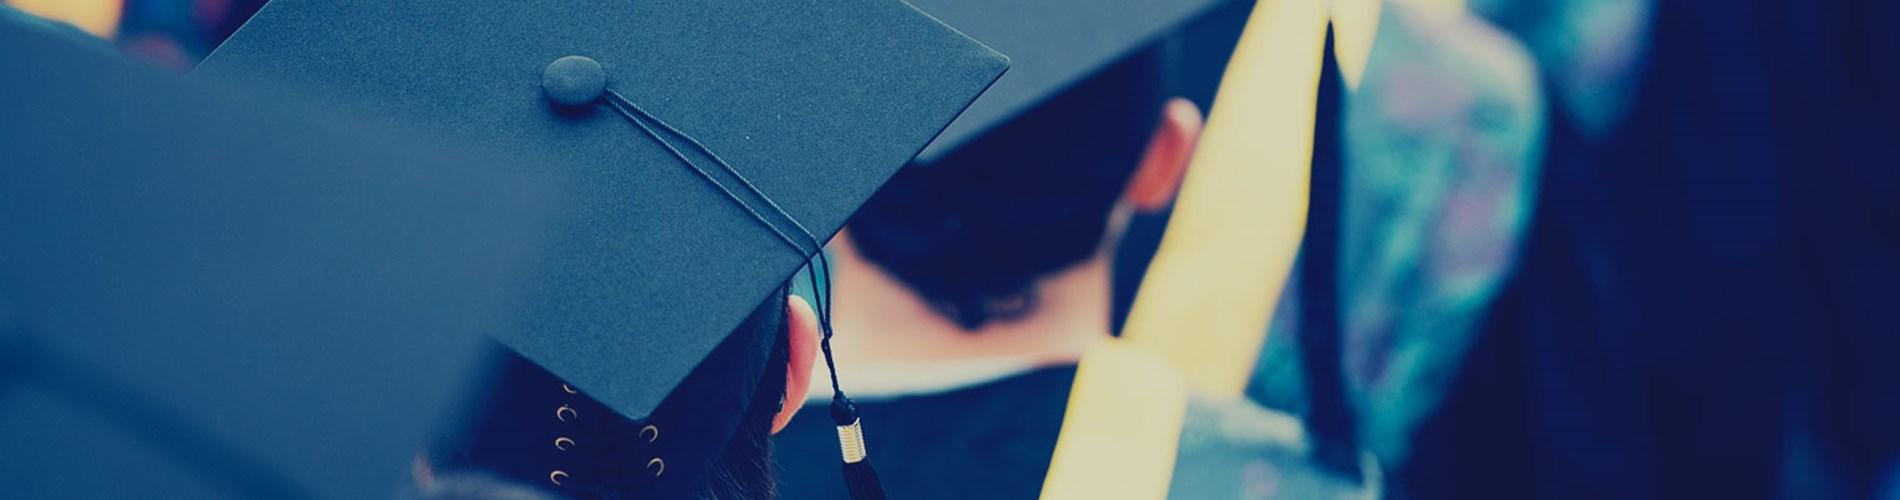 Past Scholarship Winners | NSHSS Scholarships | National